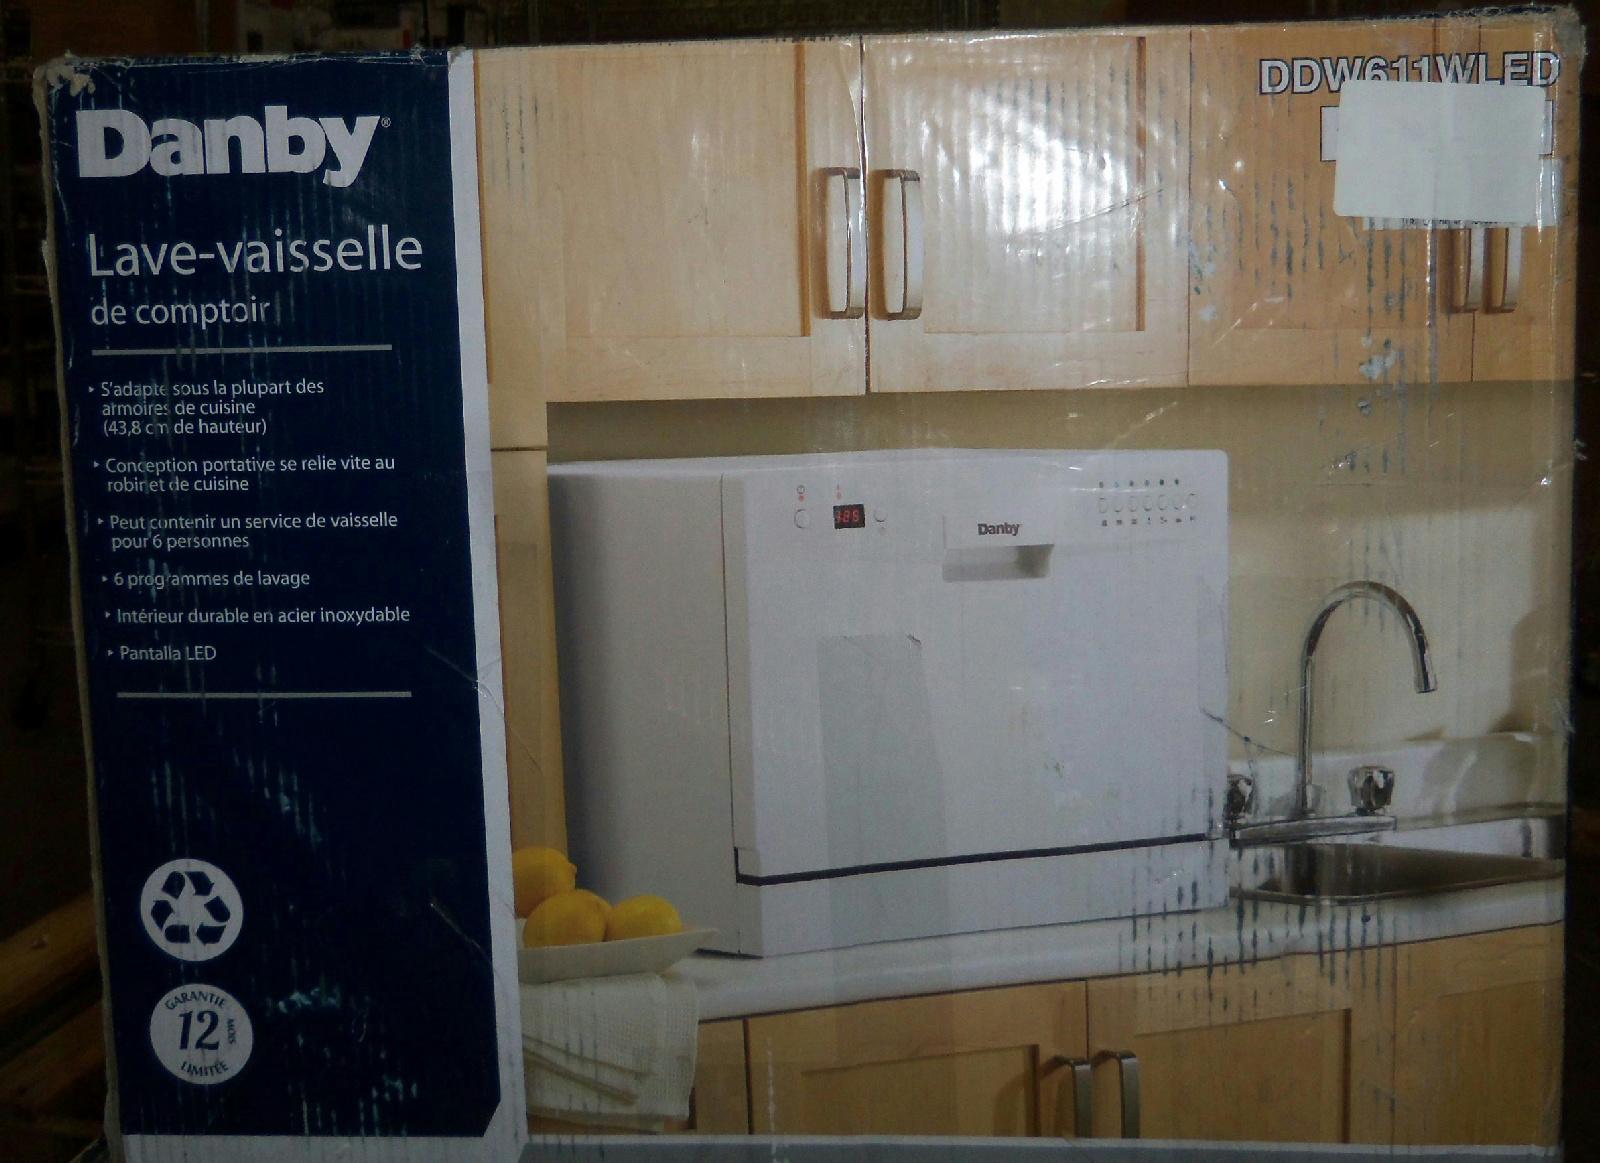 ... BOX Danby DDW611WLED Countertop Dishwasher 50x54.9x43.8 cm $340 - READ